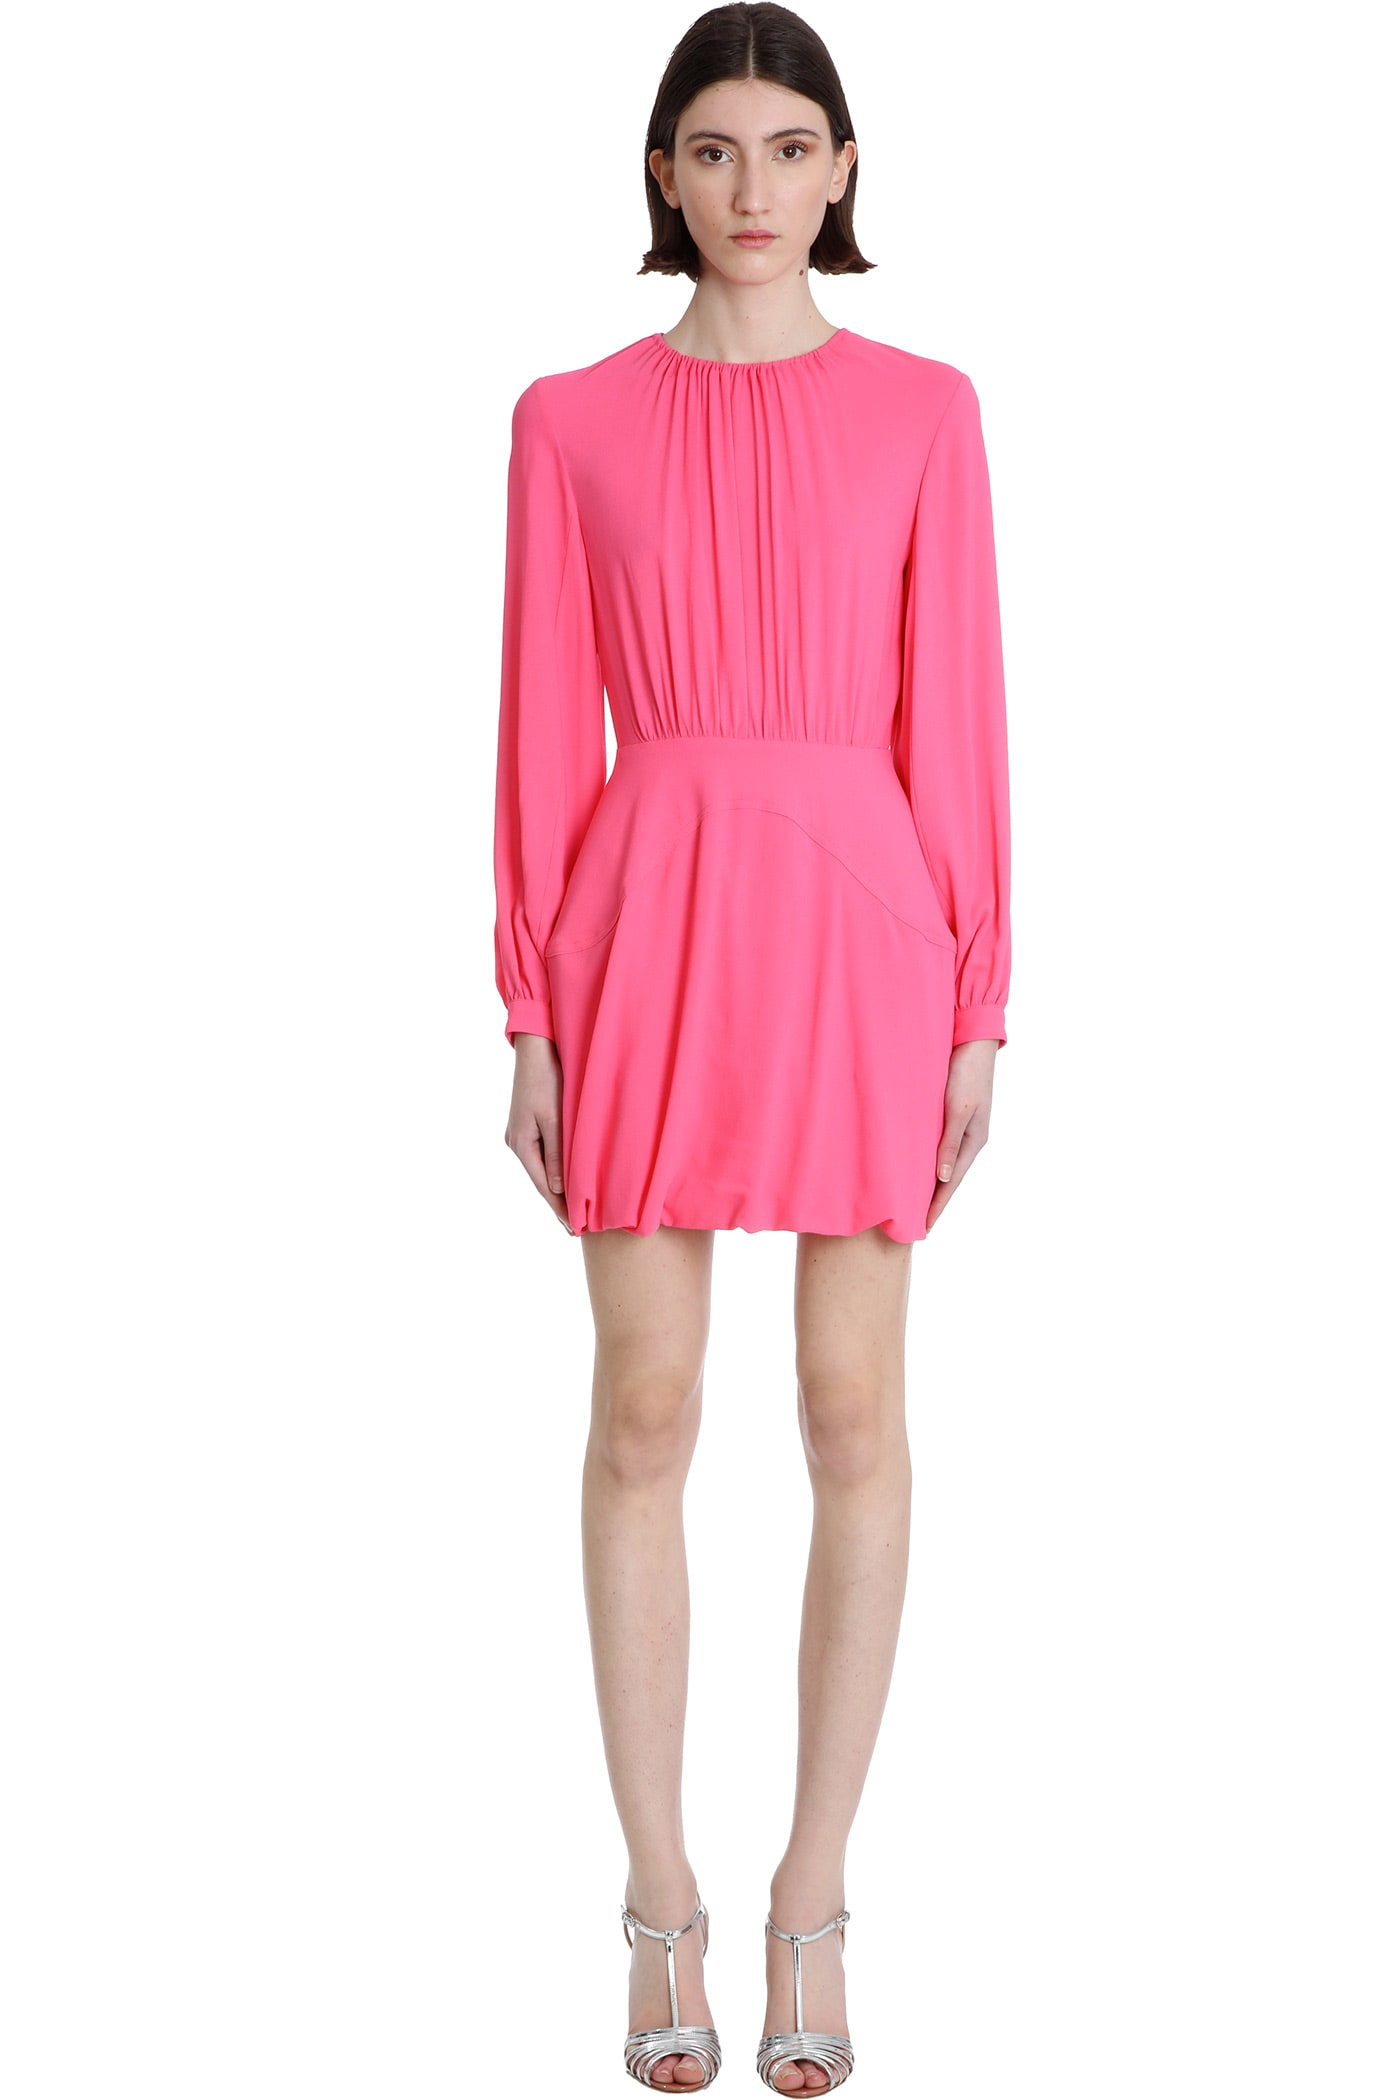 Buy Stella McCartney Amanda Dress In Fuxia Viscose online, shop Stella McCartney with free shipping